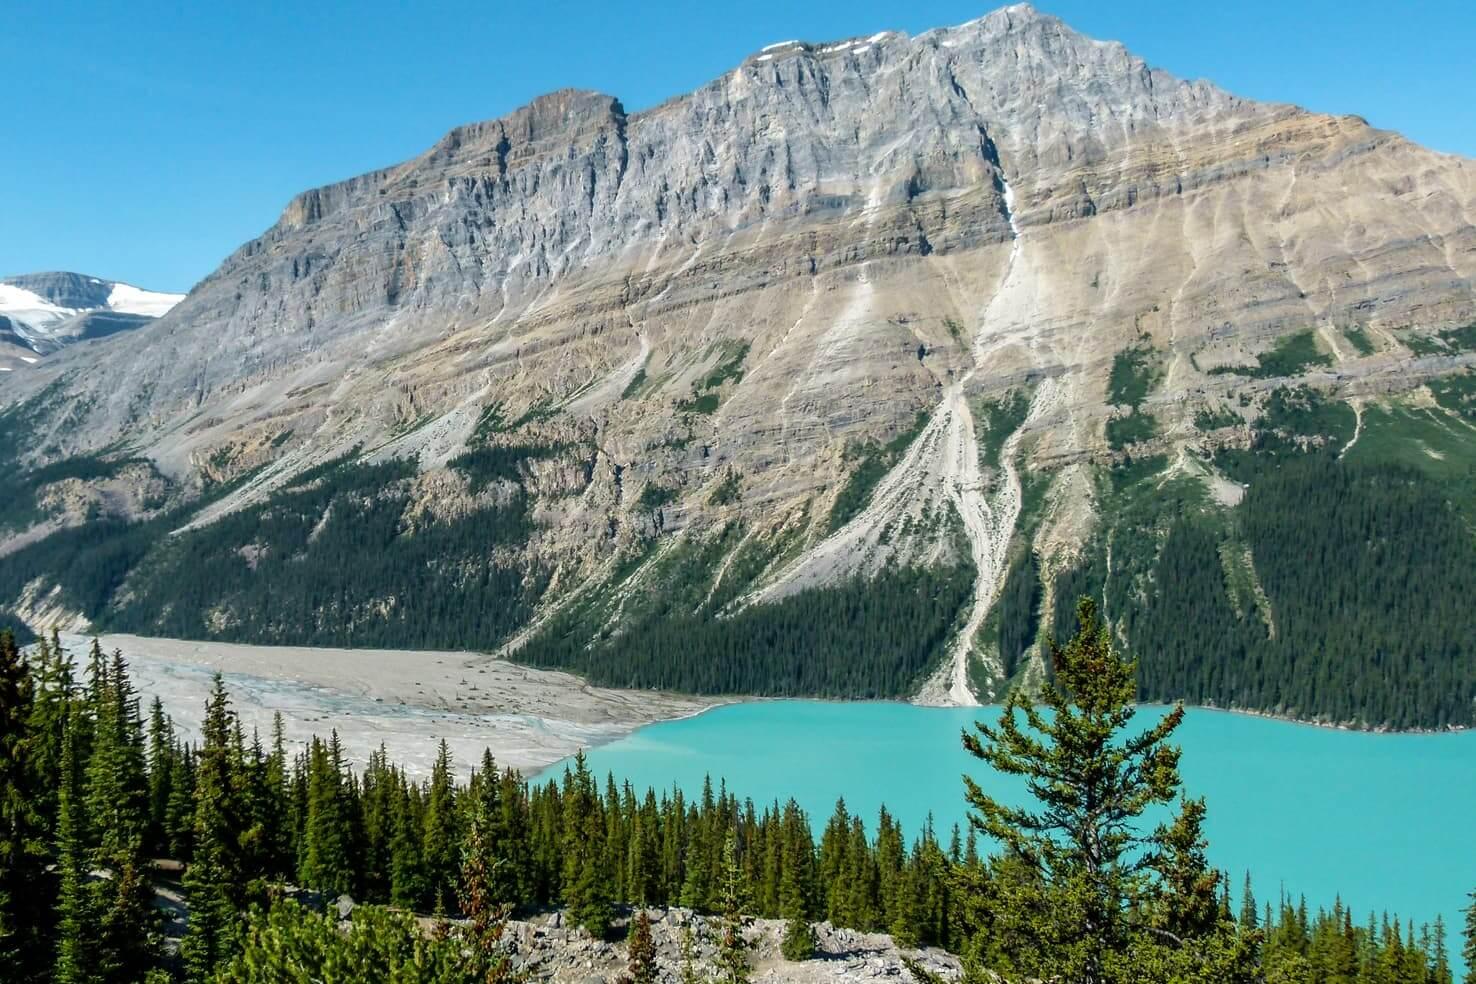 Peyto Lake, Canada - photoshopped or real